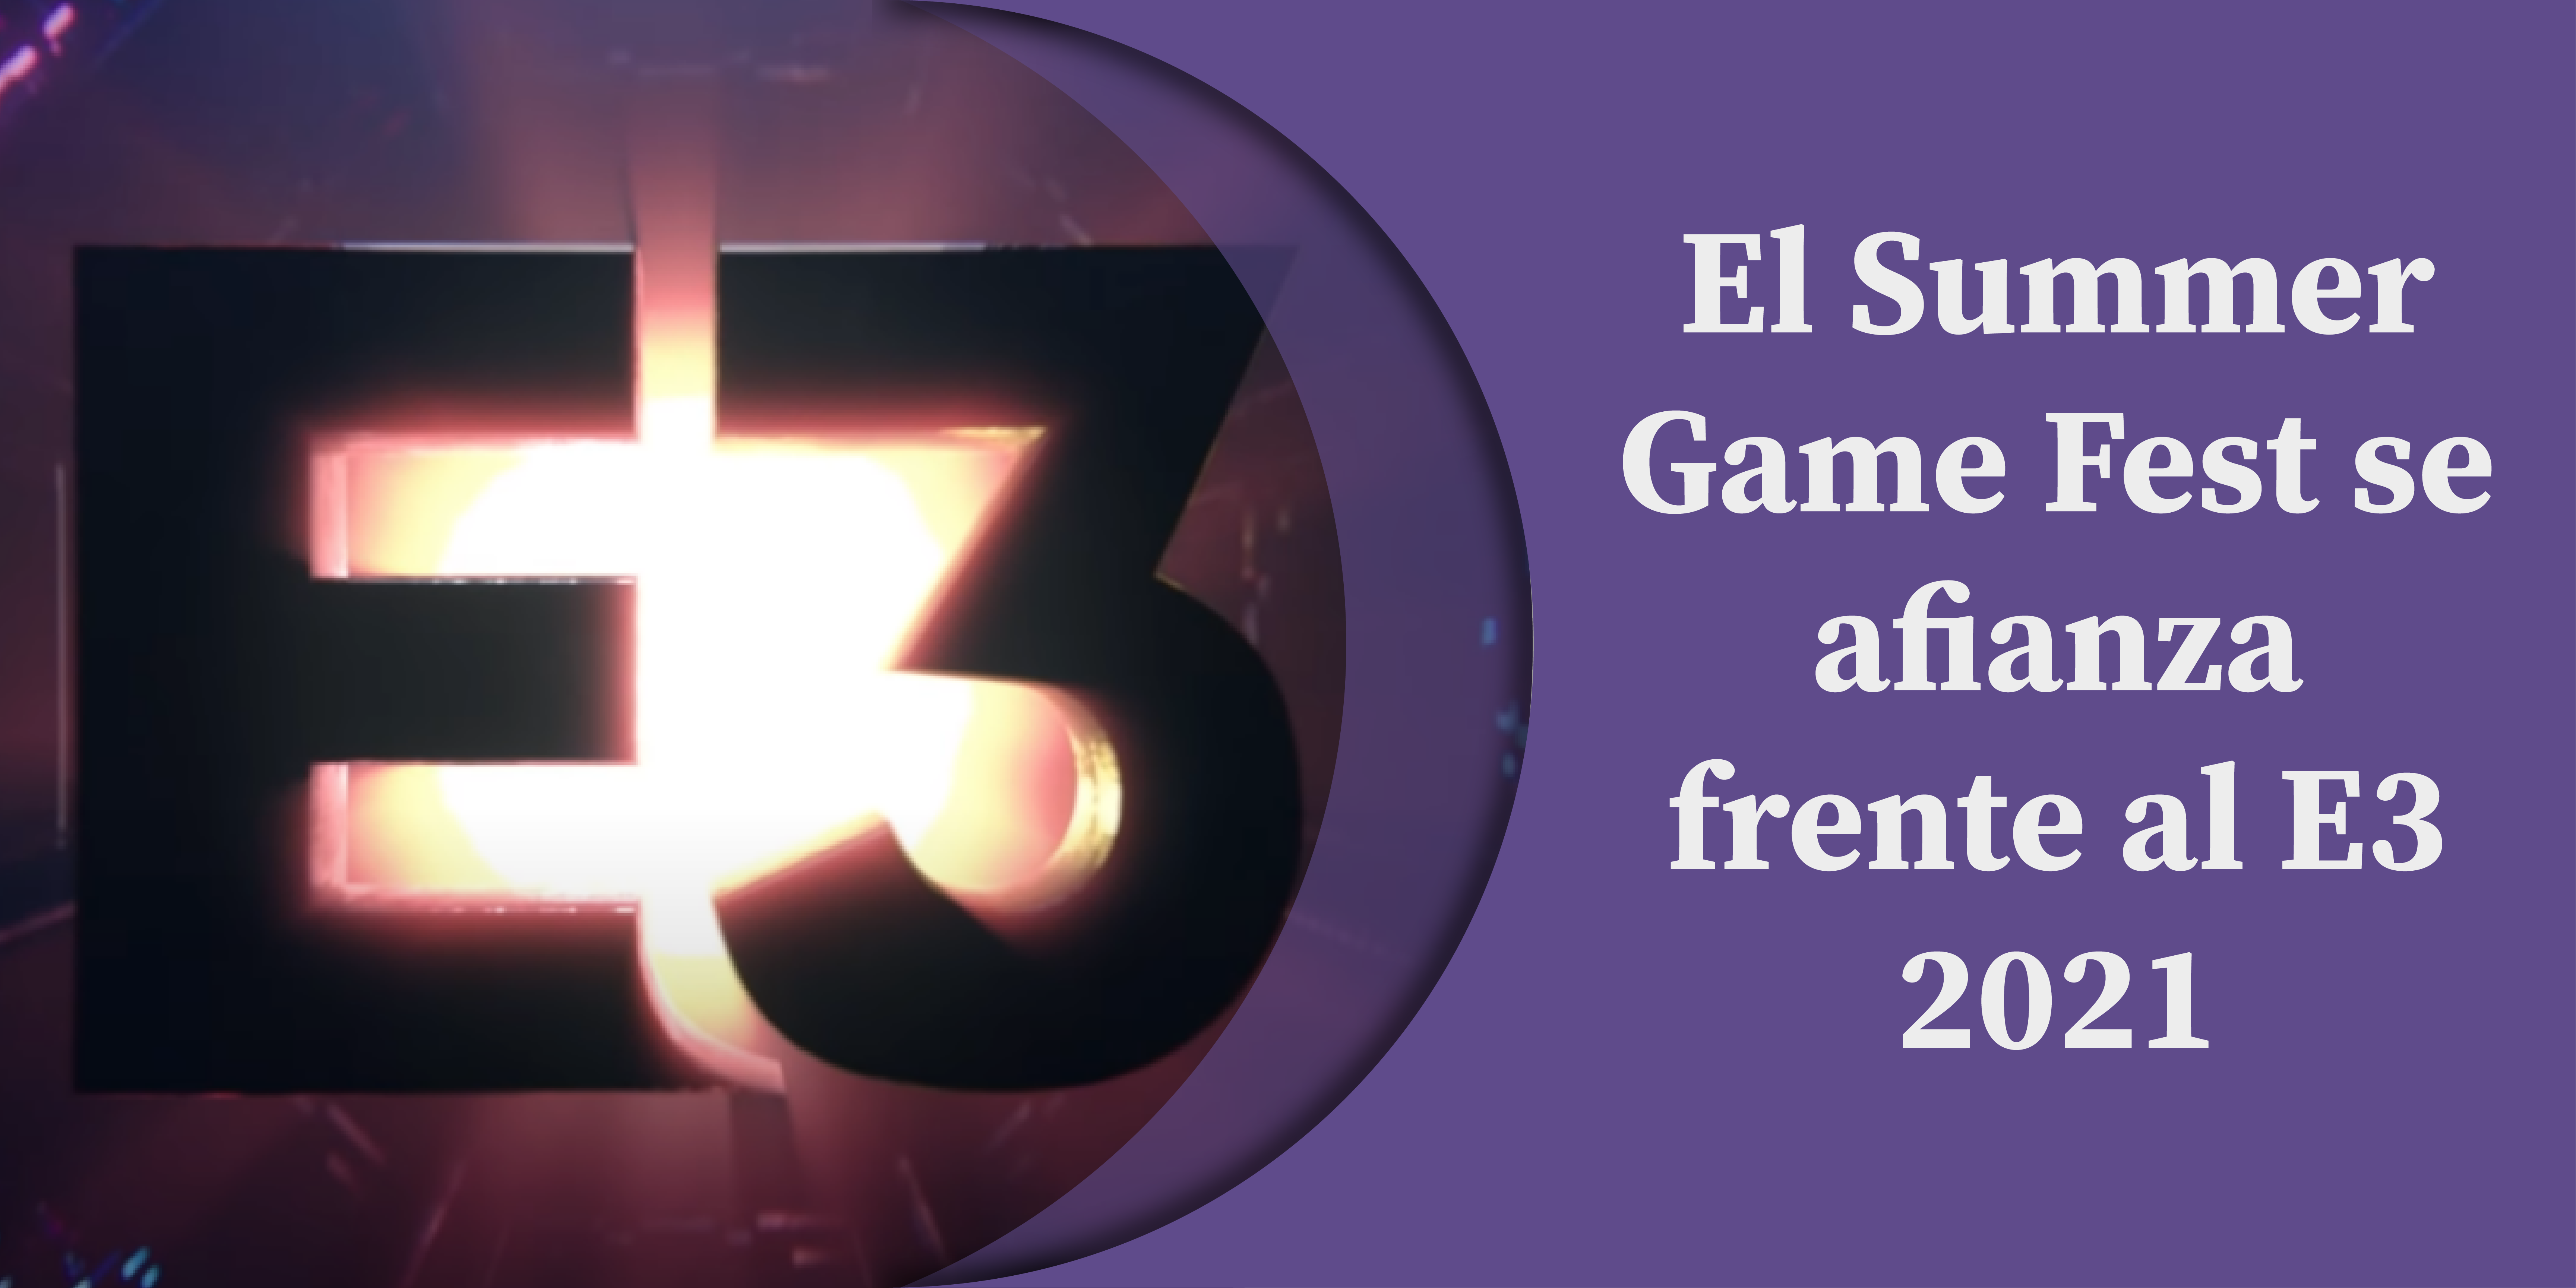 El Summer Game Fest se afianza frente al E3 2021